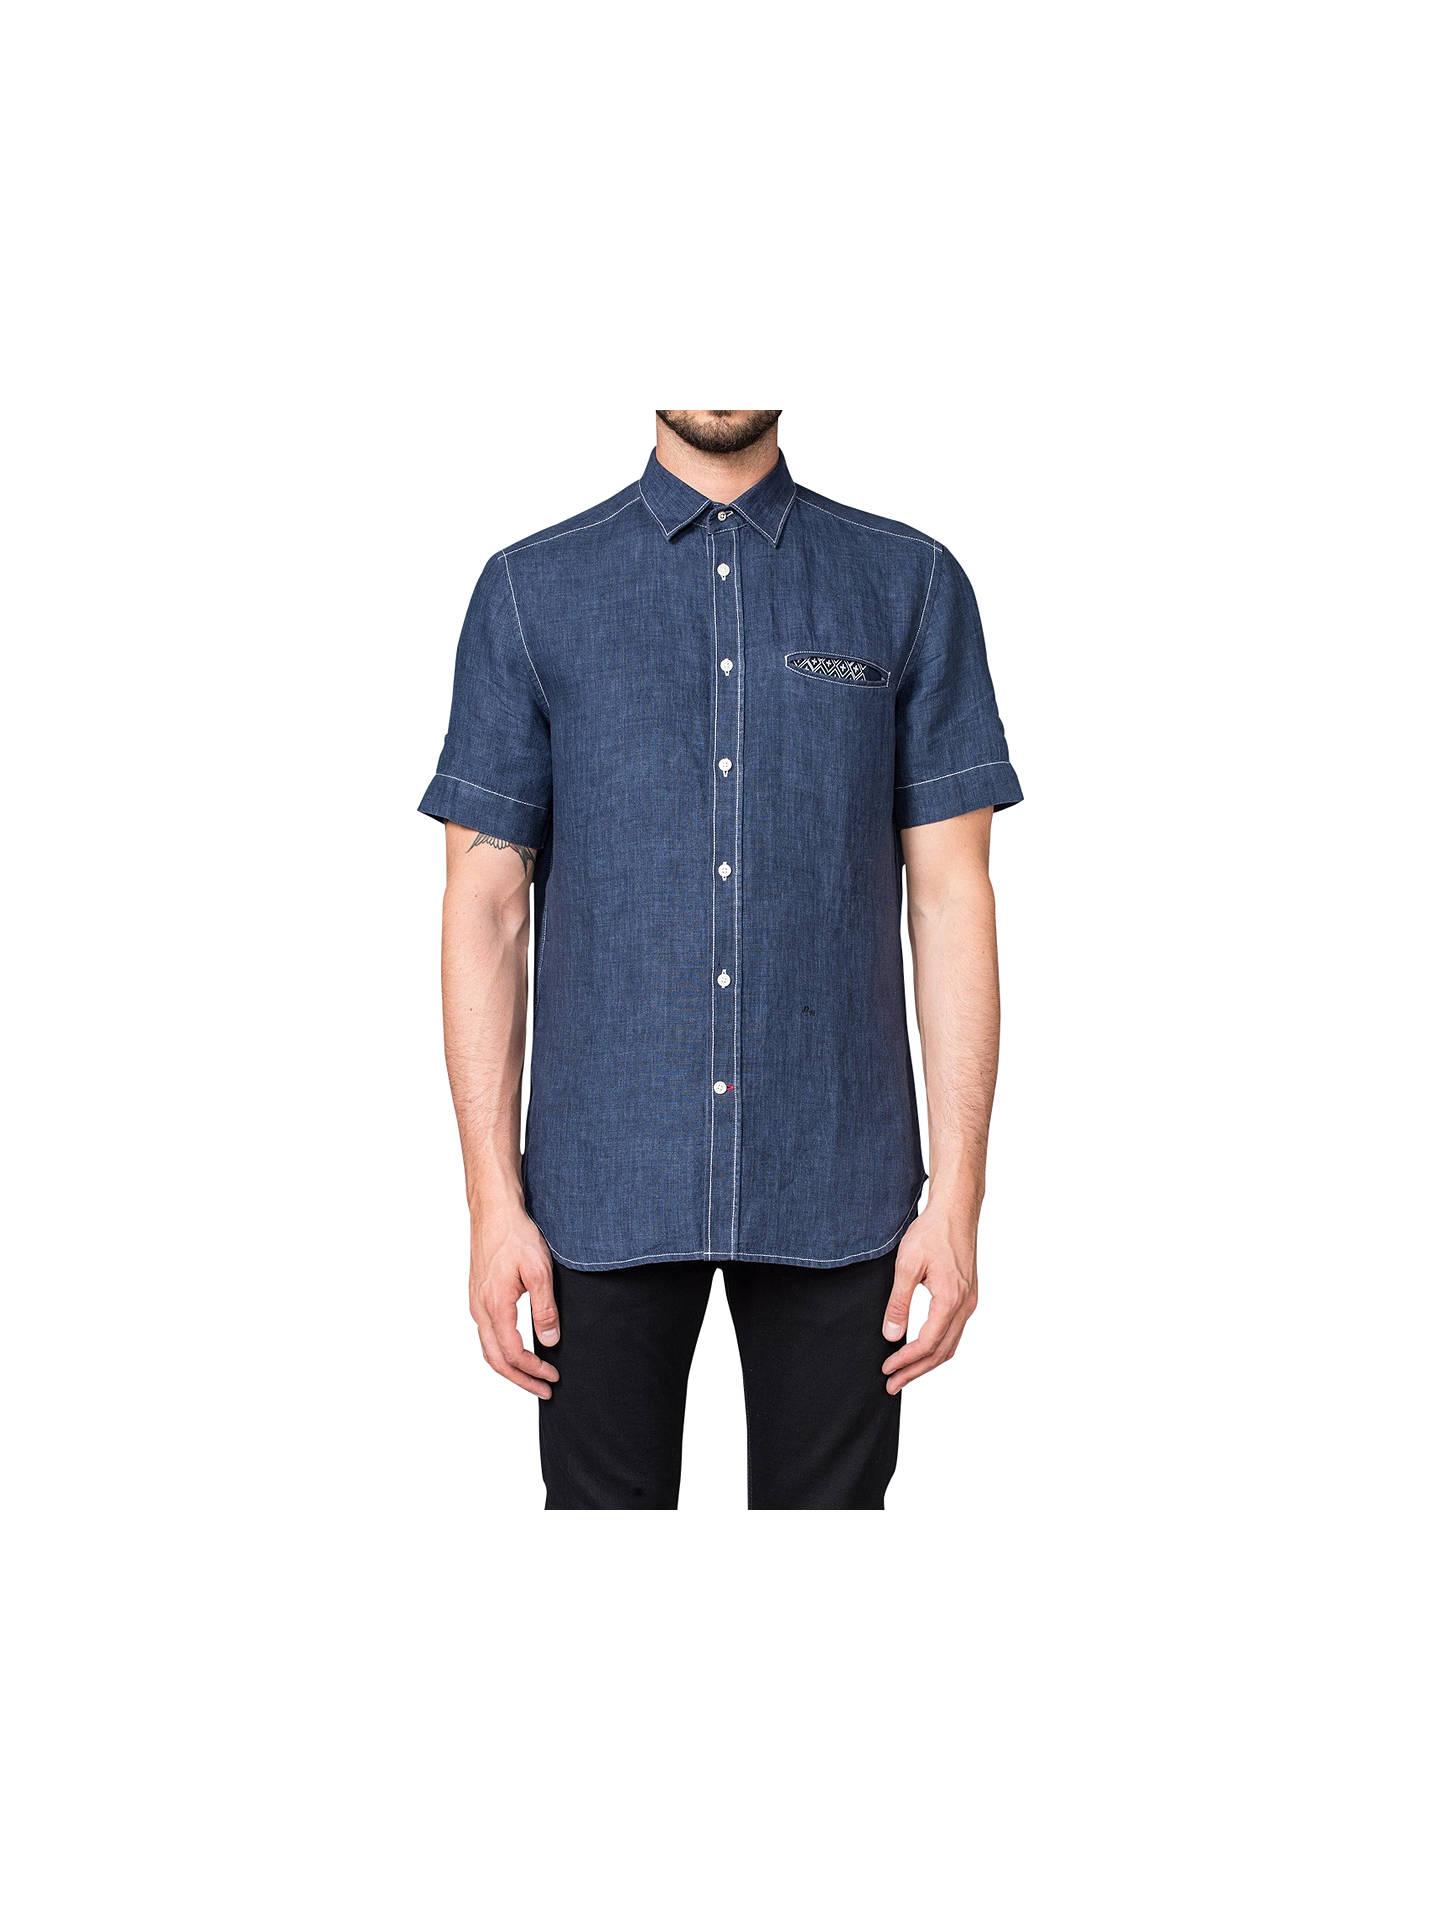 18067824a9a Diesel S-Emiko Denim Shirt at John Lewis   Partners